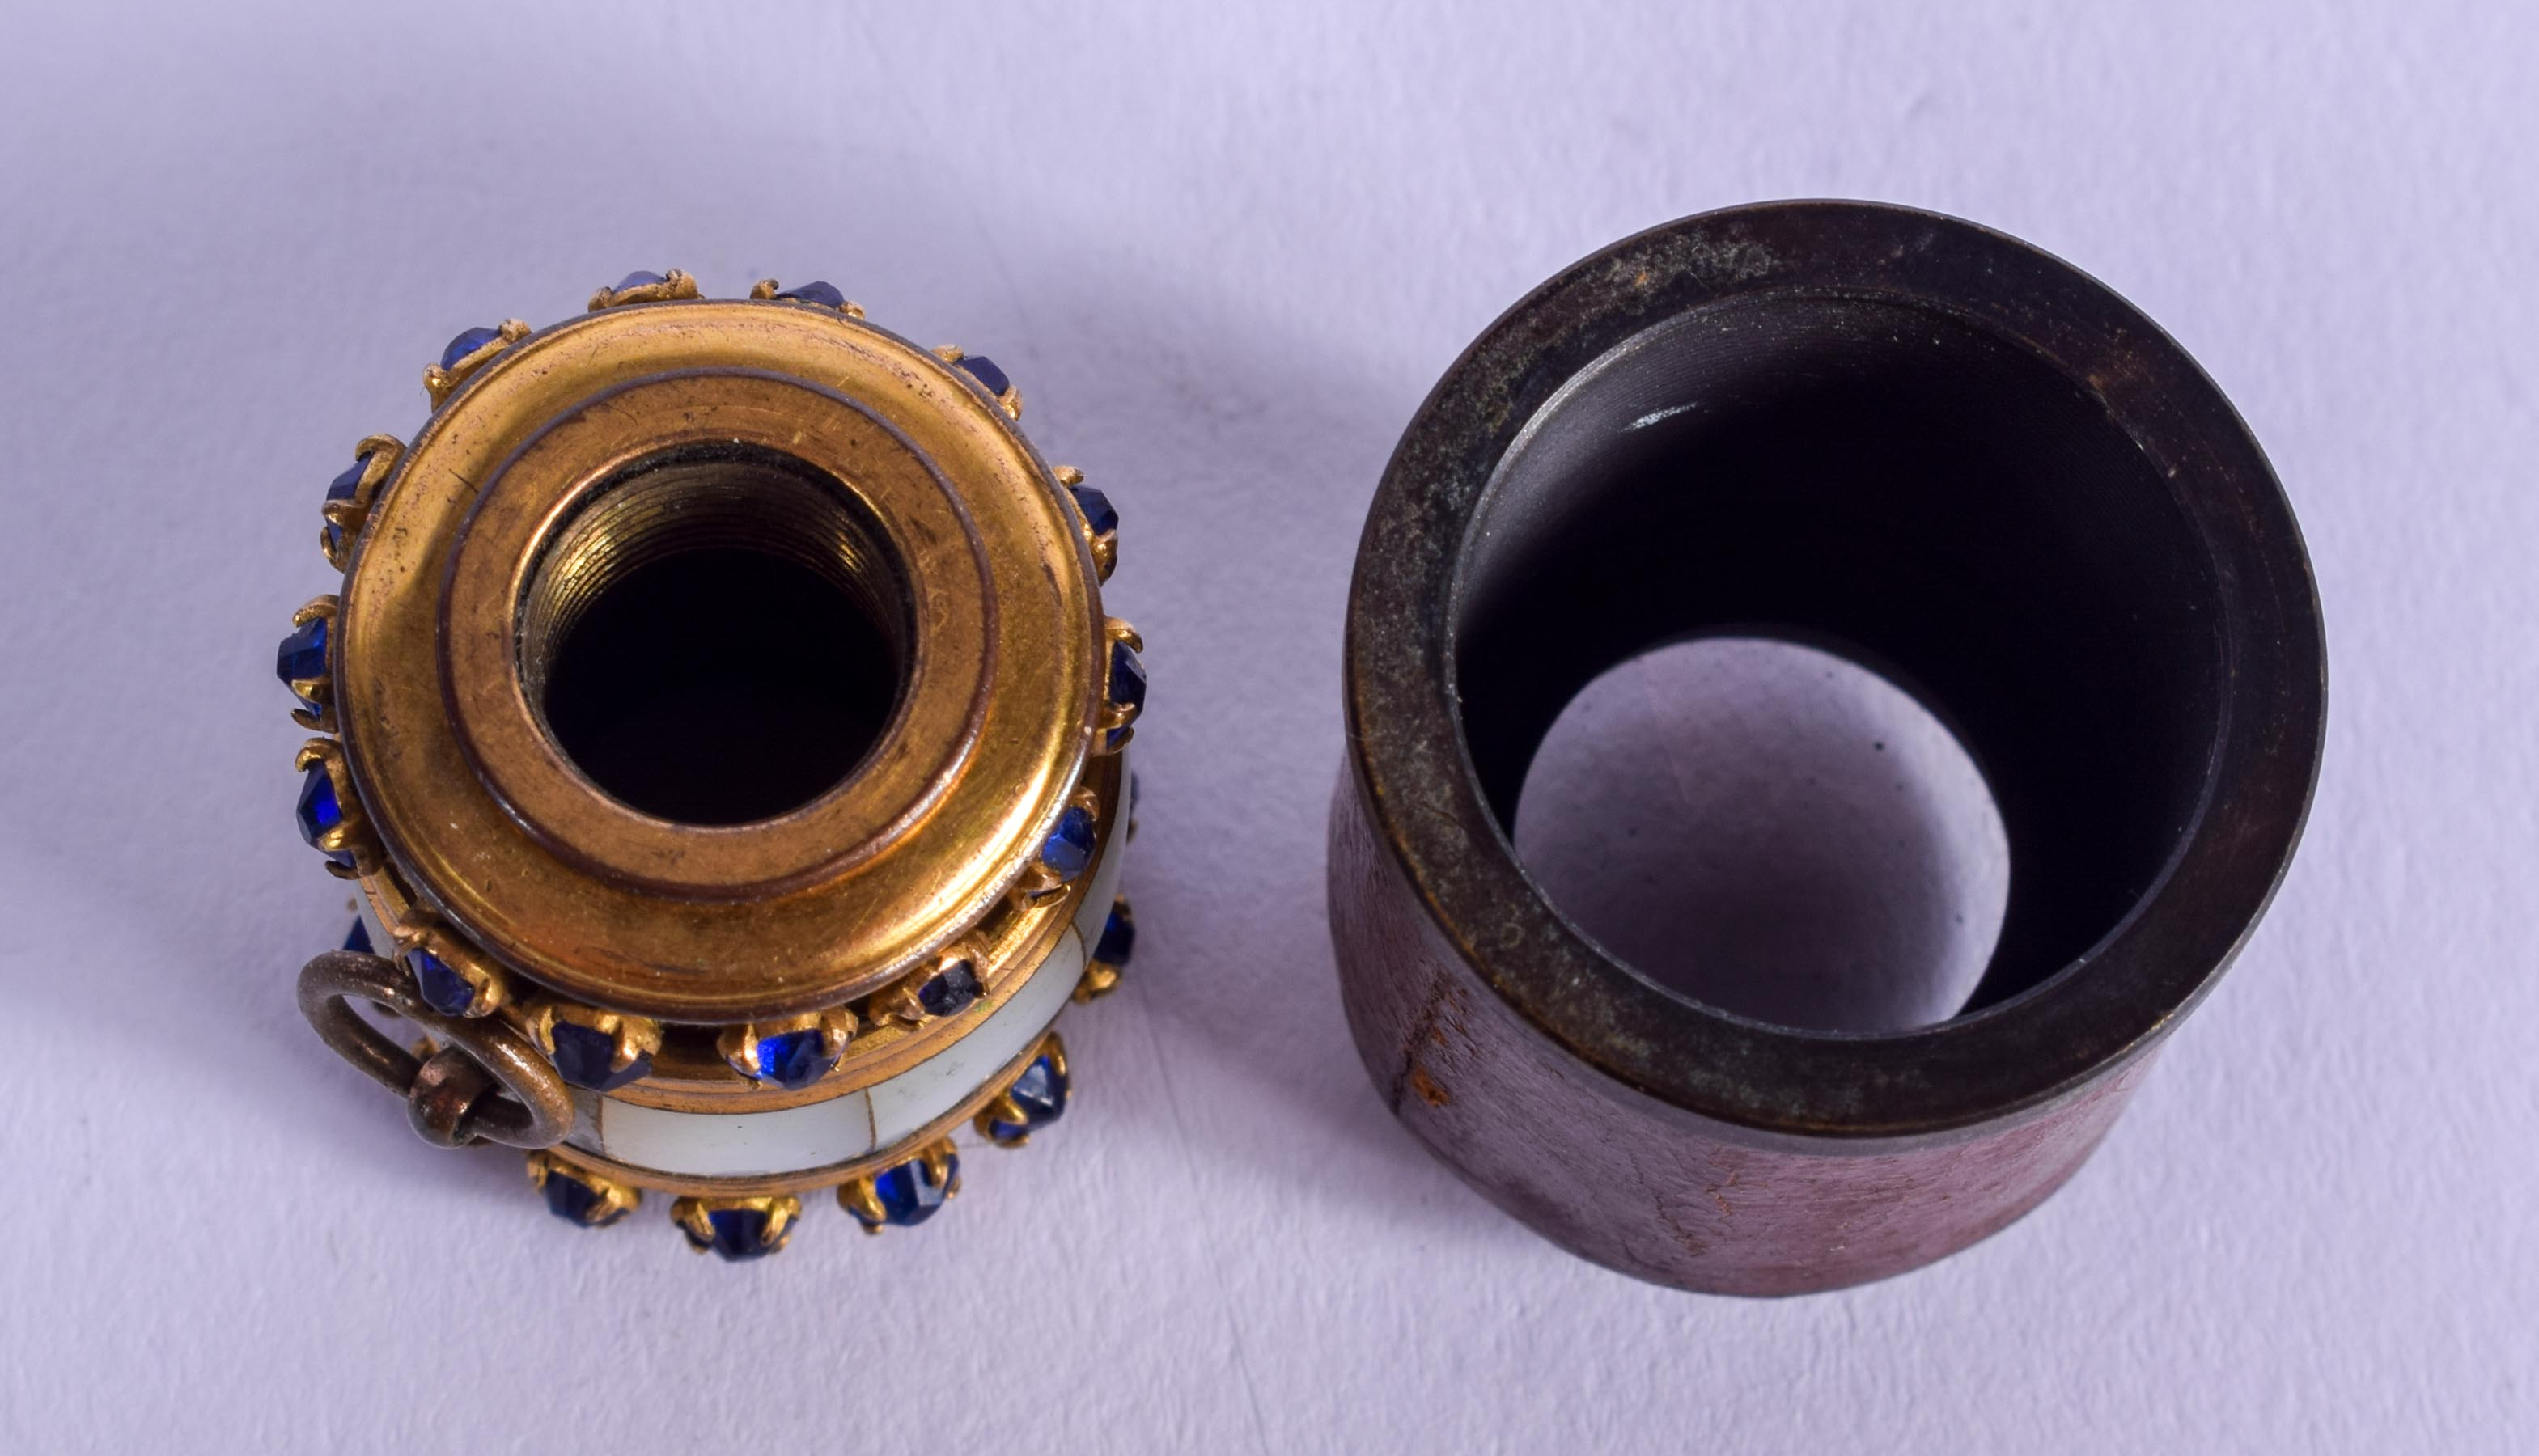 TWO RARE ANTIQUE SINGLE LENS MINIATURE MONOCULAR. (2) - Image 4 of 4